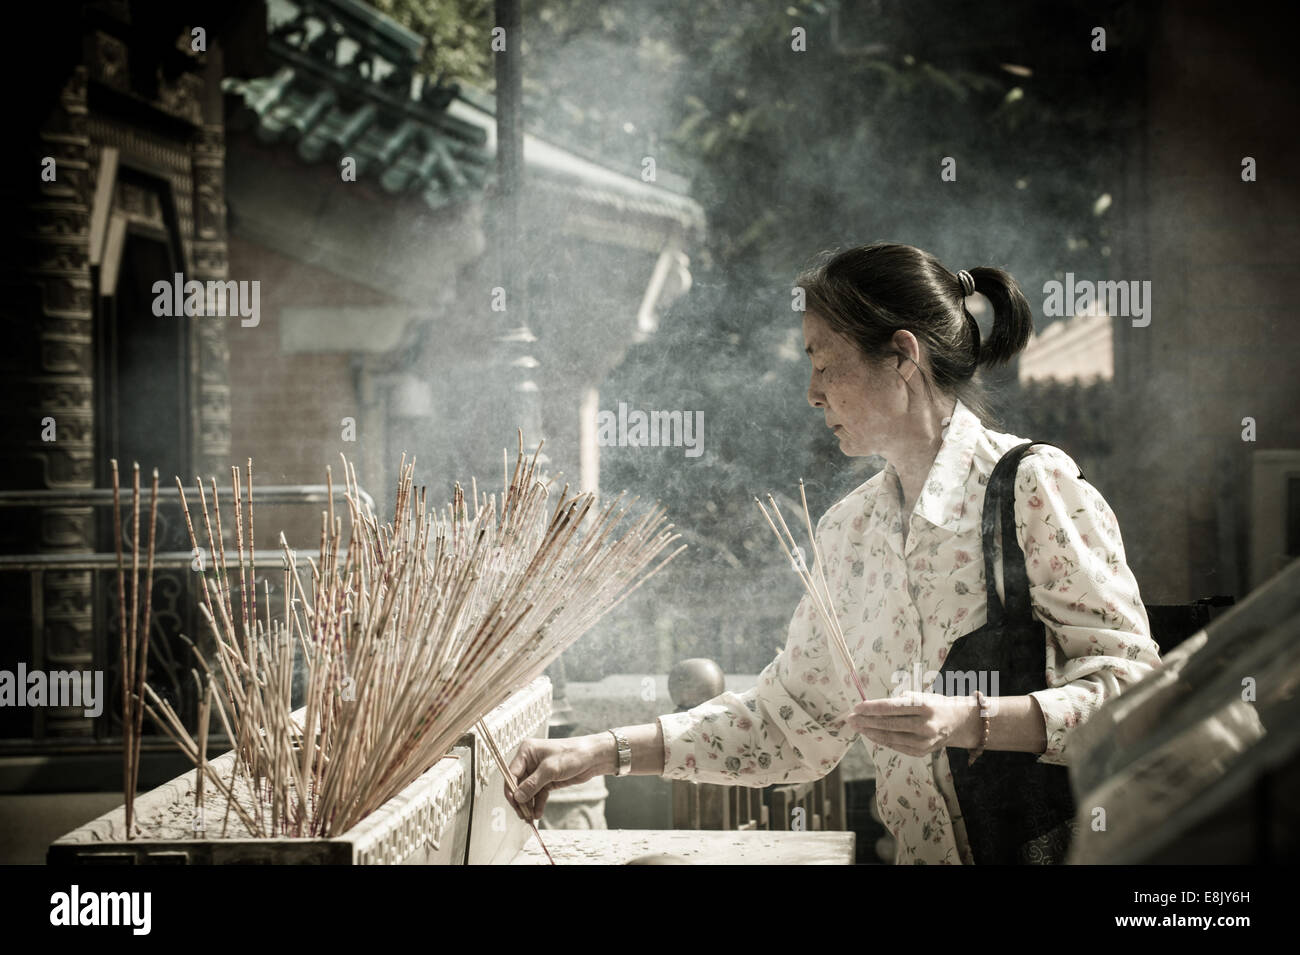 Worshiper holding burning joss sticks during a celebrations in Wong Tai Sin temple, Kowloon. Hong Kong, China - Stock Image